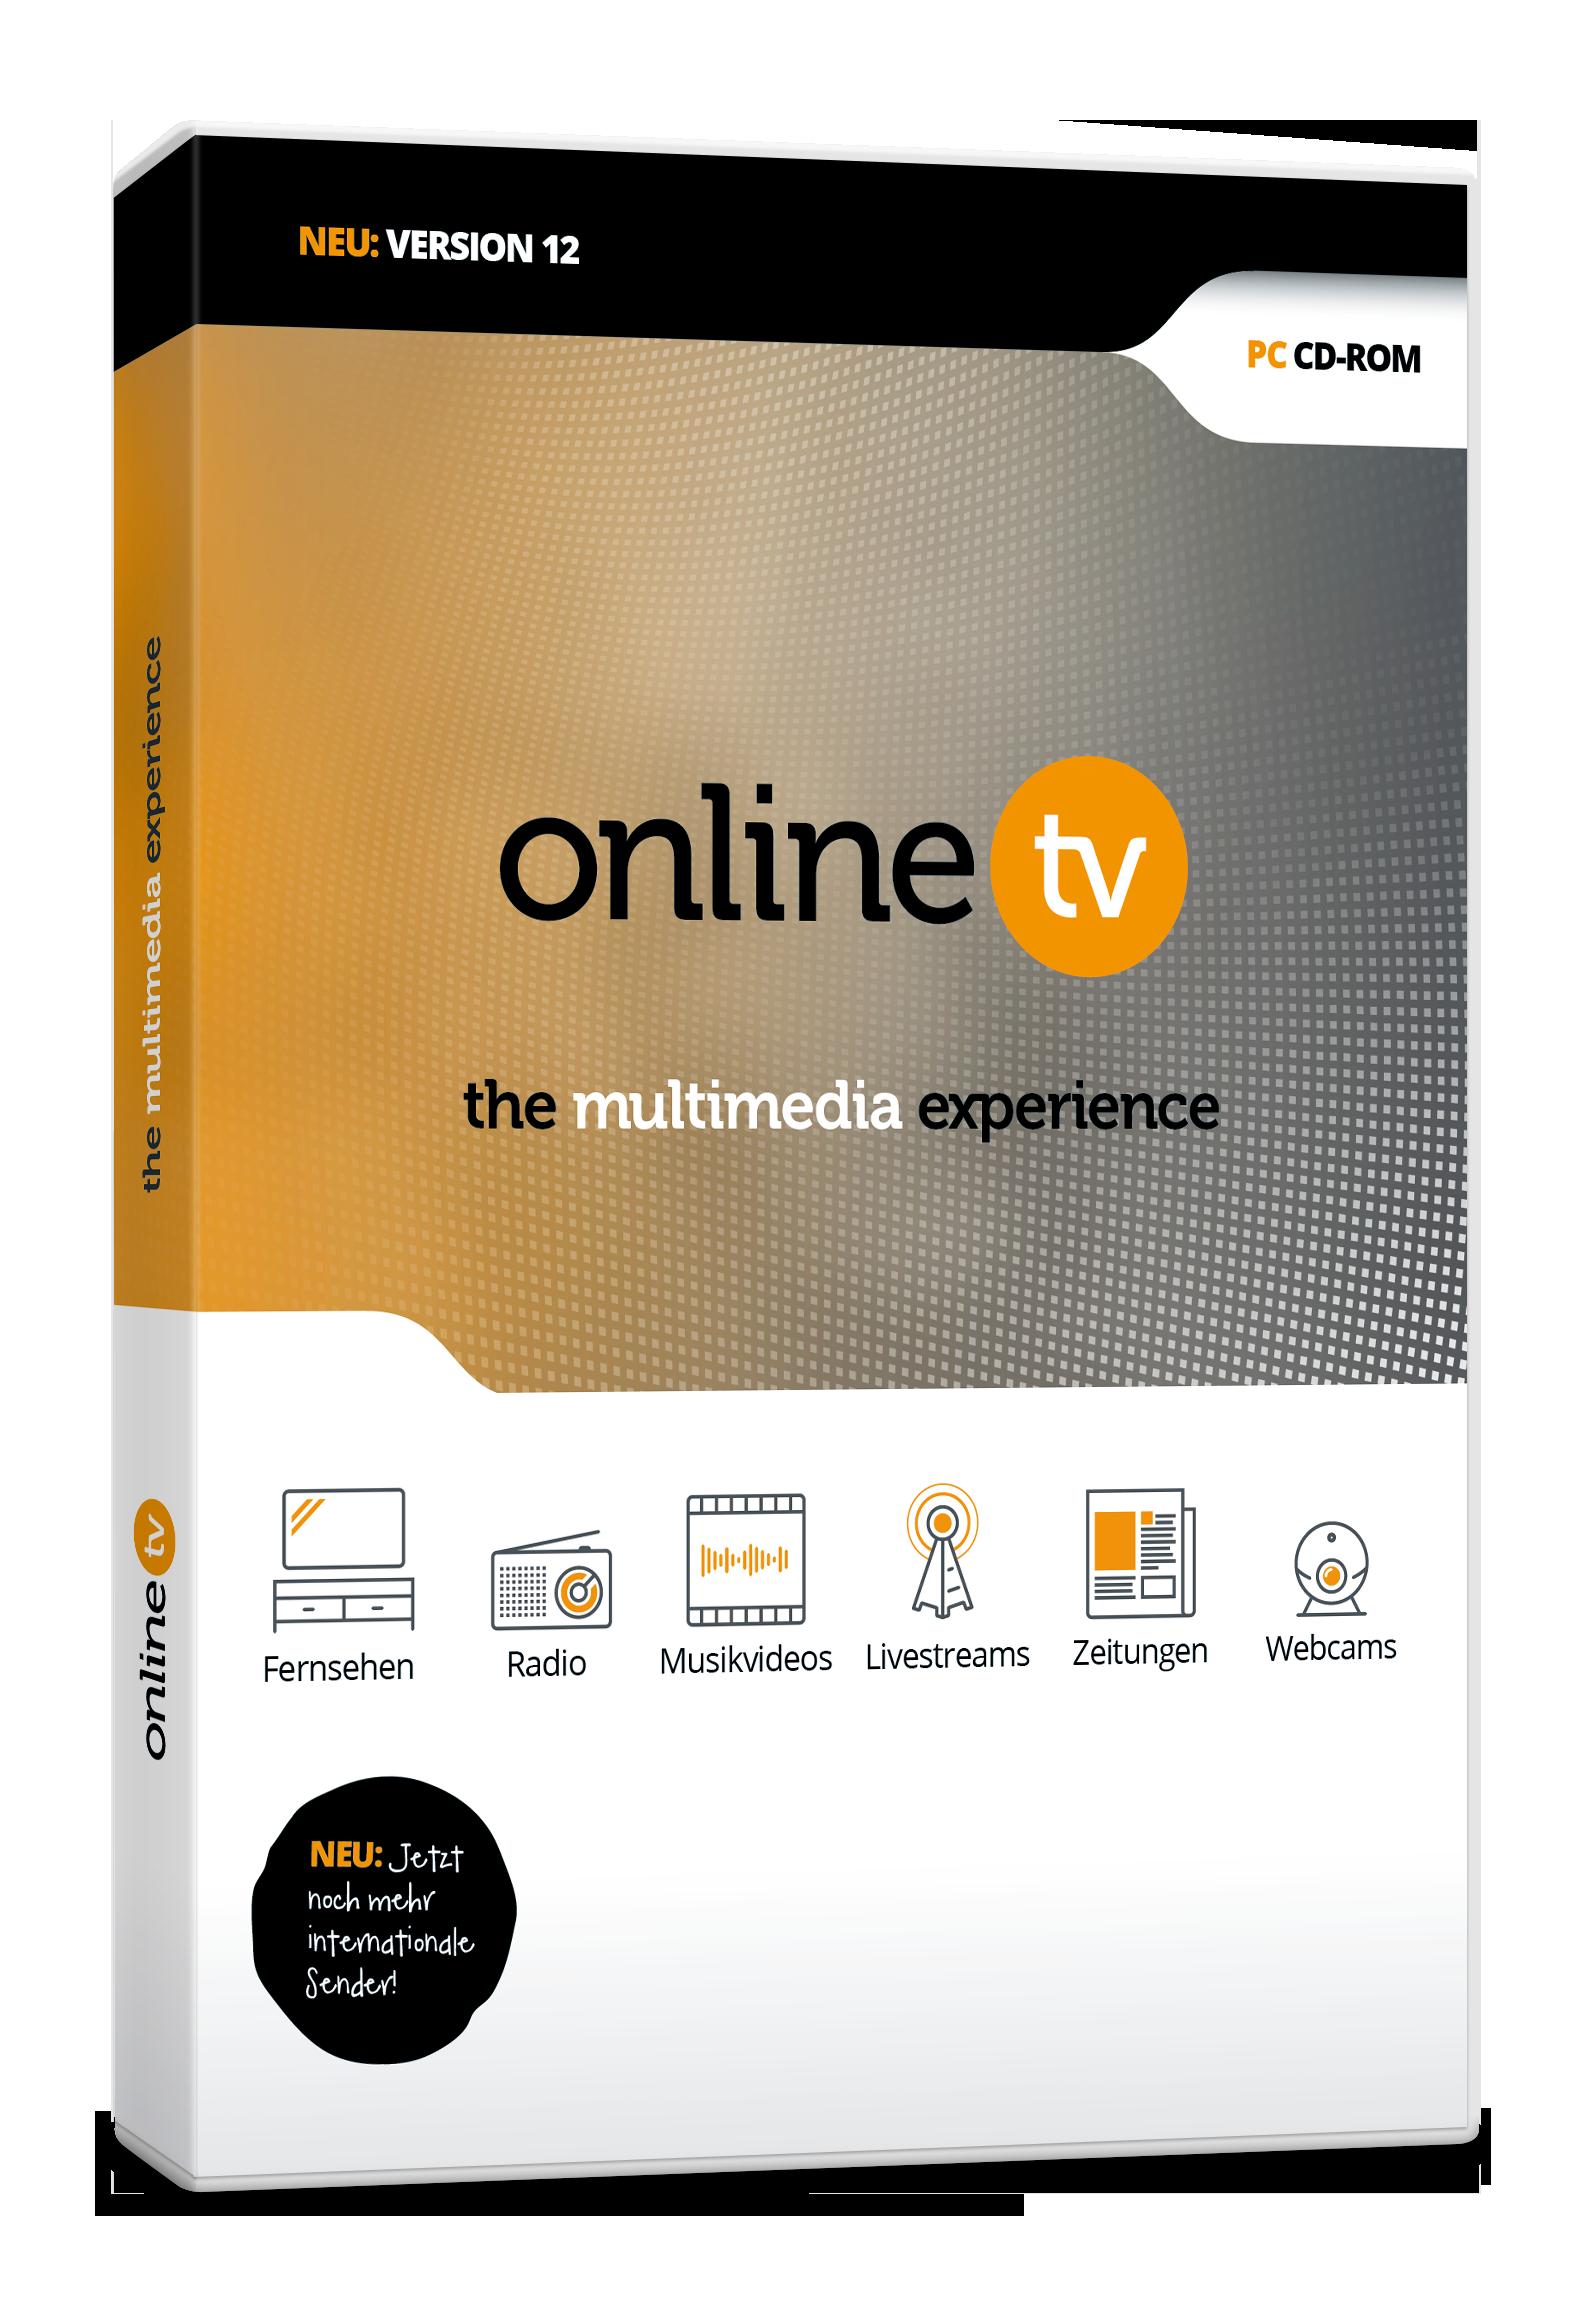 onlinetv-recorder-12-zugriff-auf-hunderte-musikvideos-tv-livestreams-radiosender-webcams-und-mehr-wi